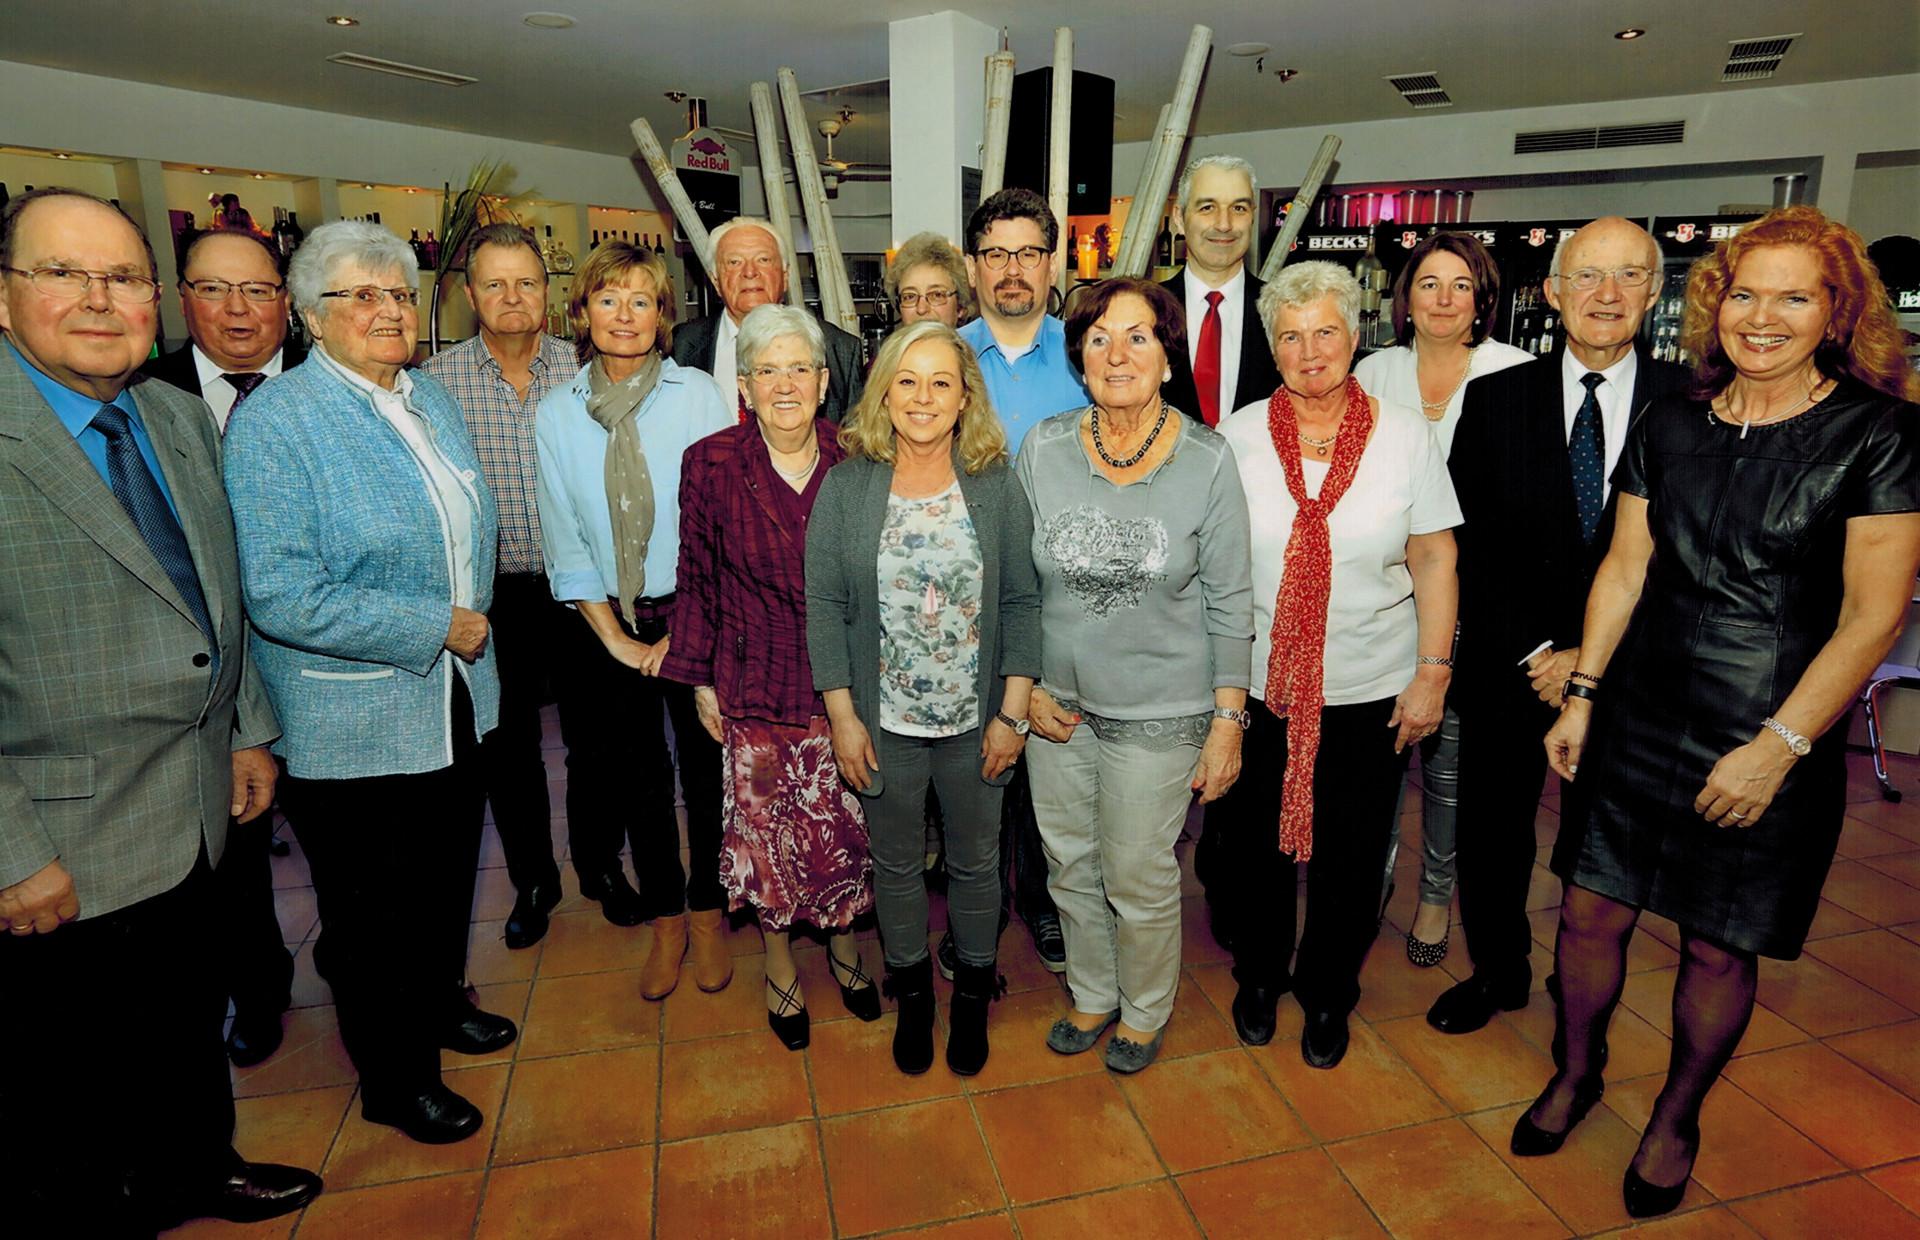 Jubilarehrung 2016: Ohligser TV ehrt langjährige Mitglieder